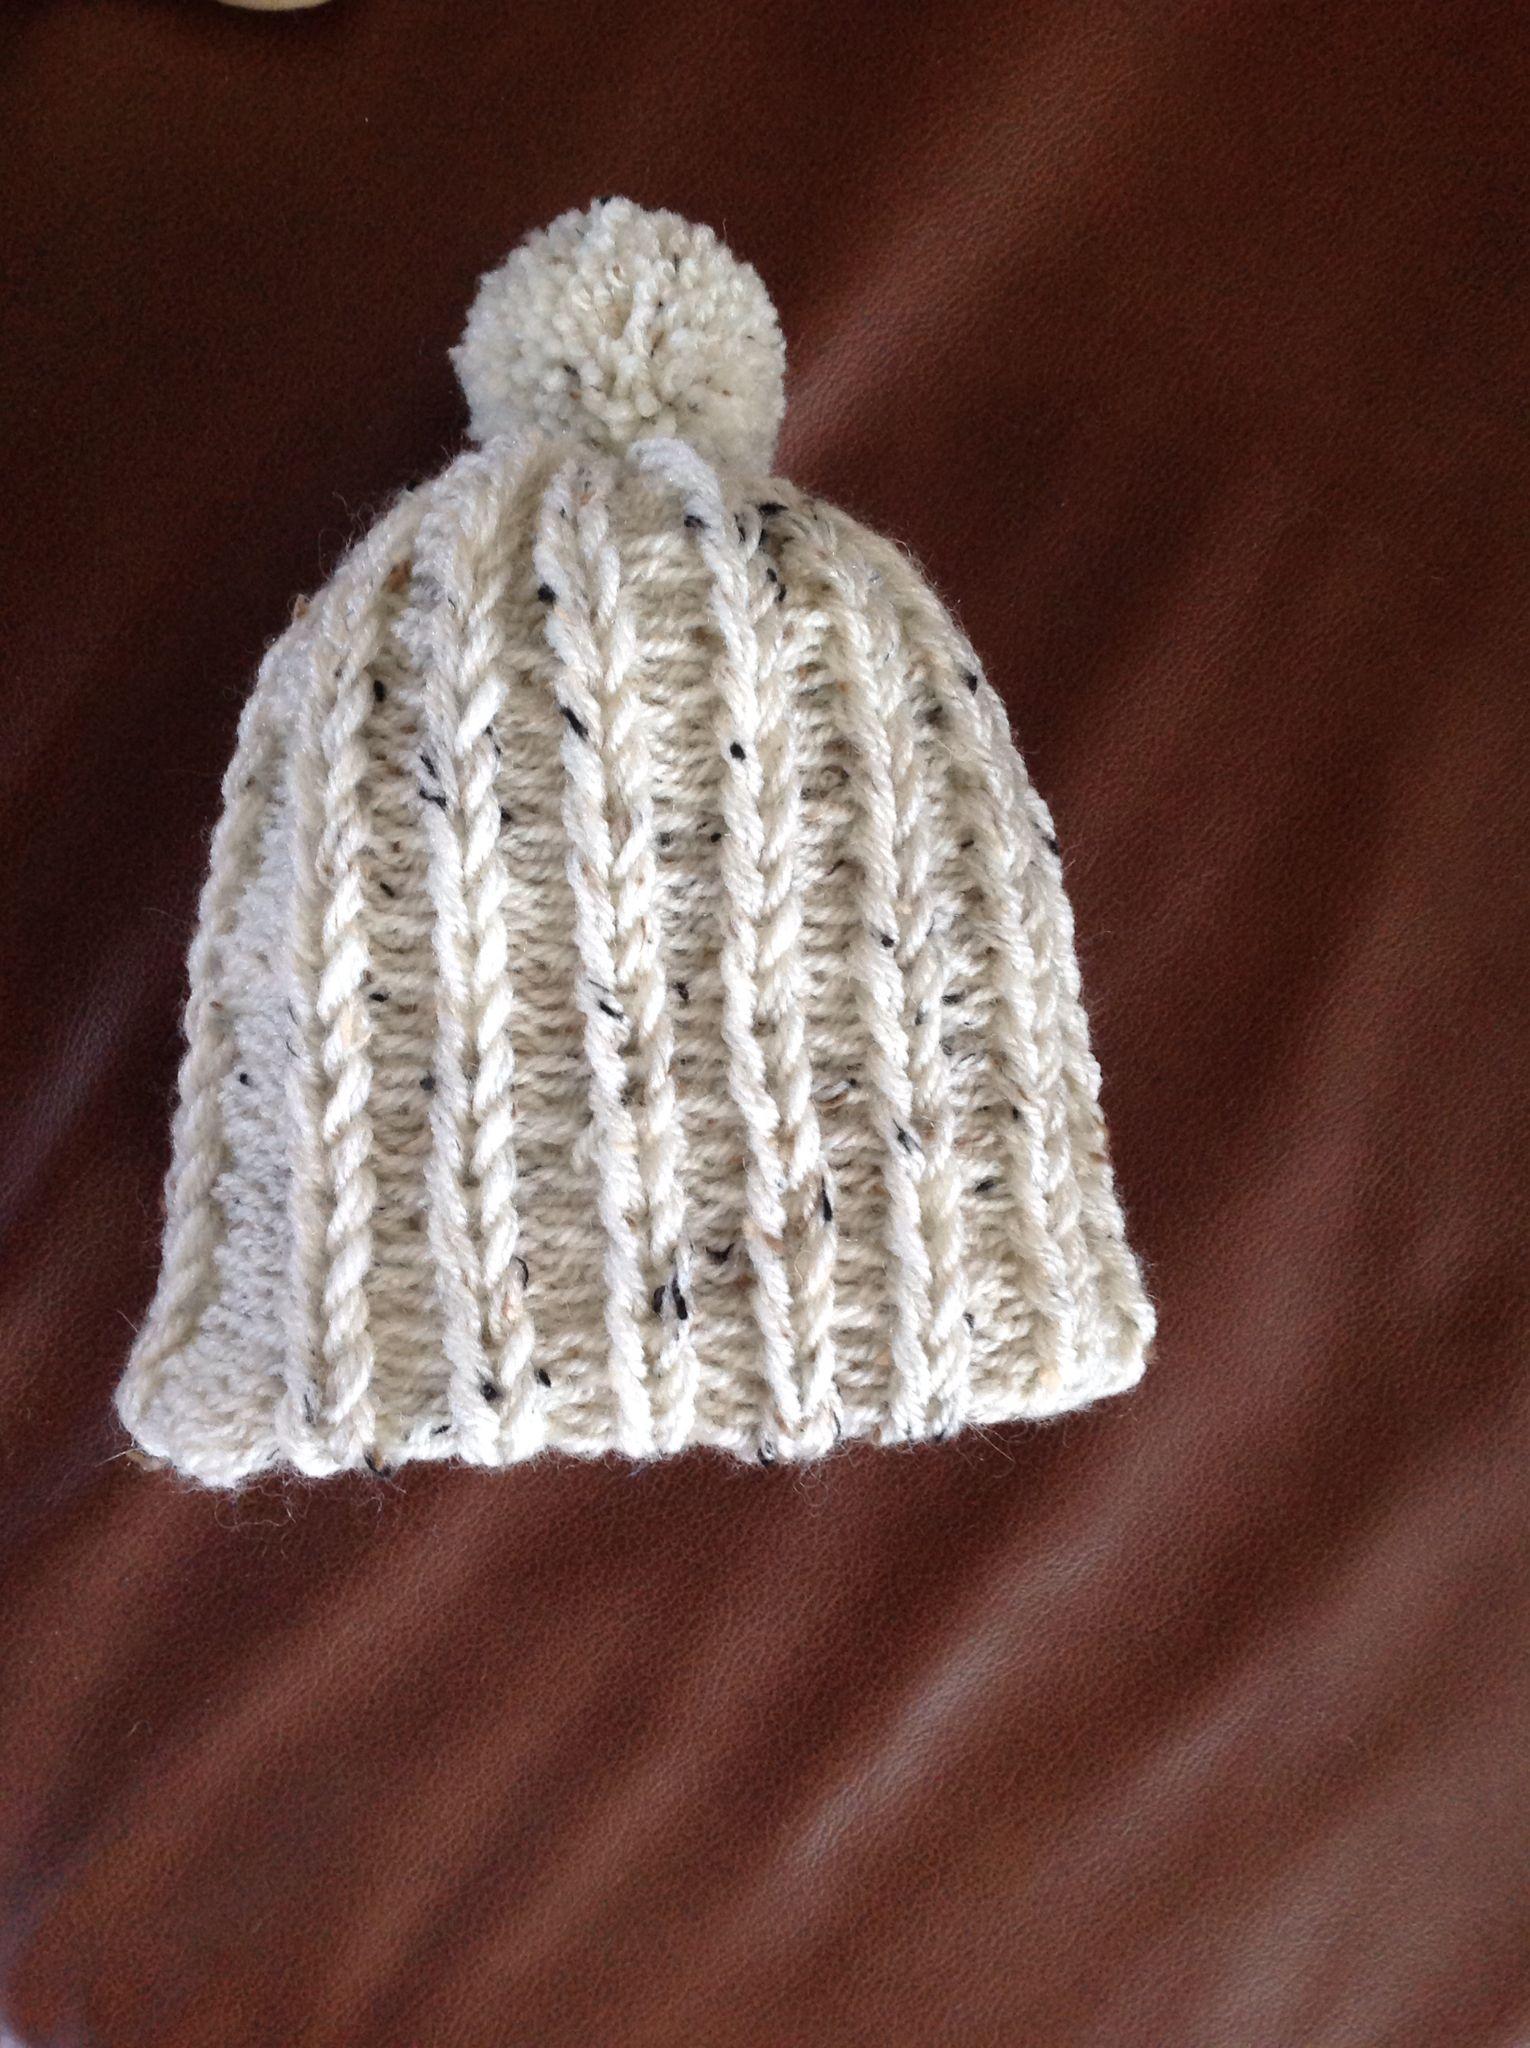 Ribbed baby hat - addi express kingsize | addi king | Pinterest